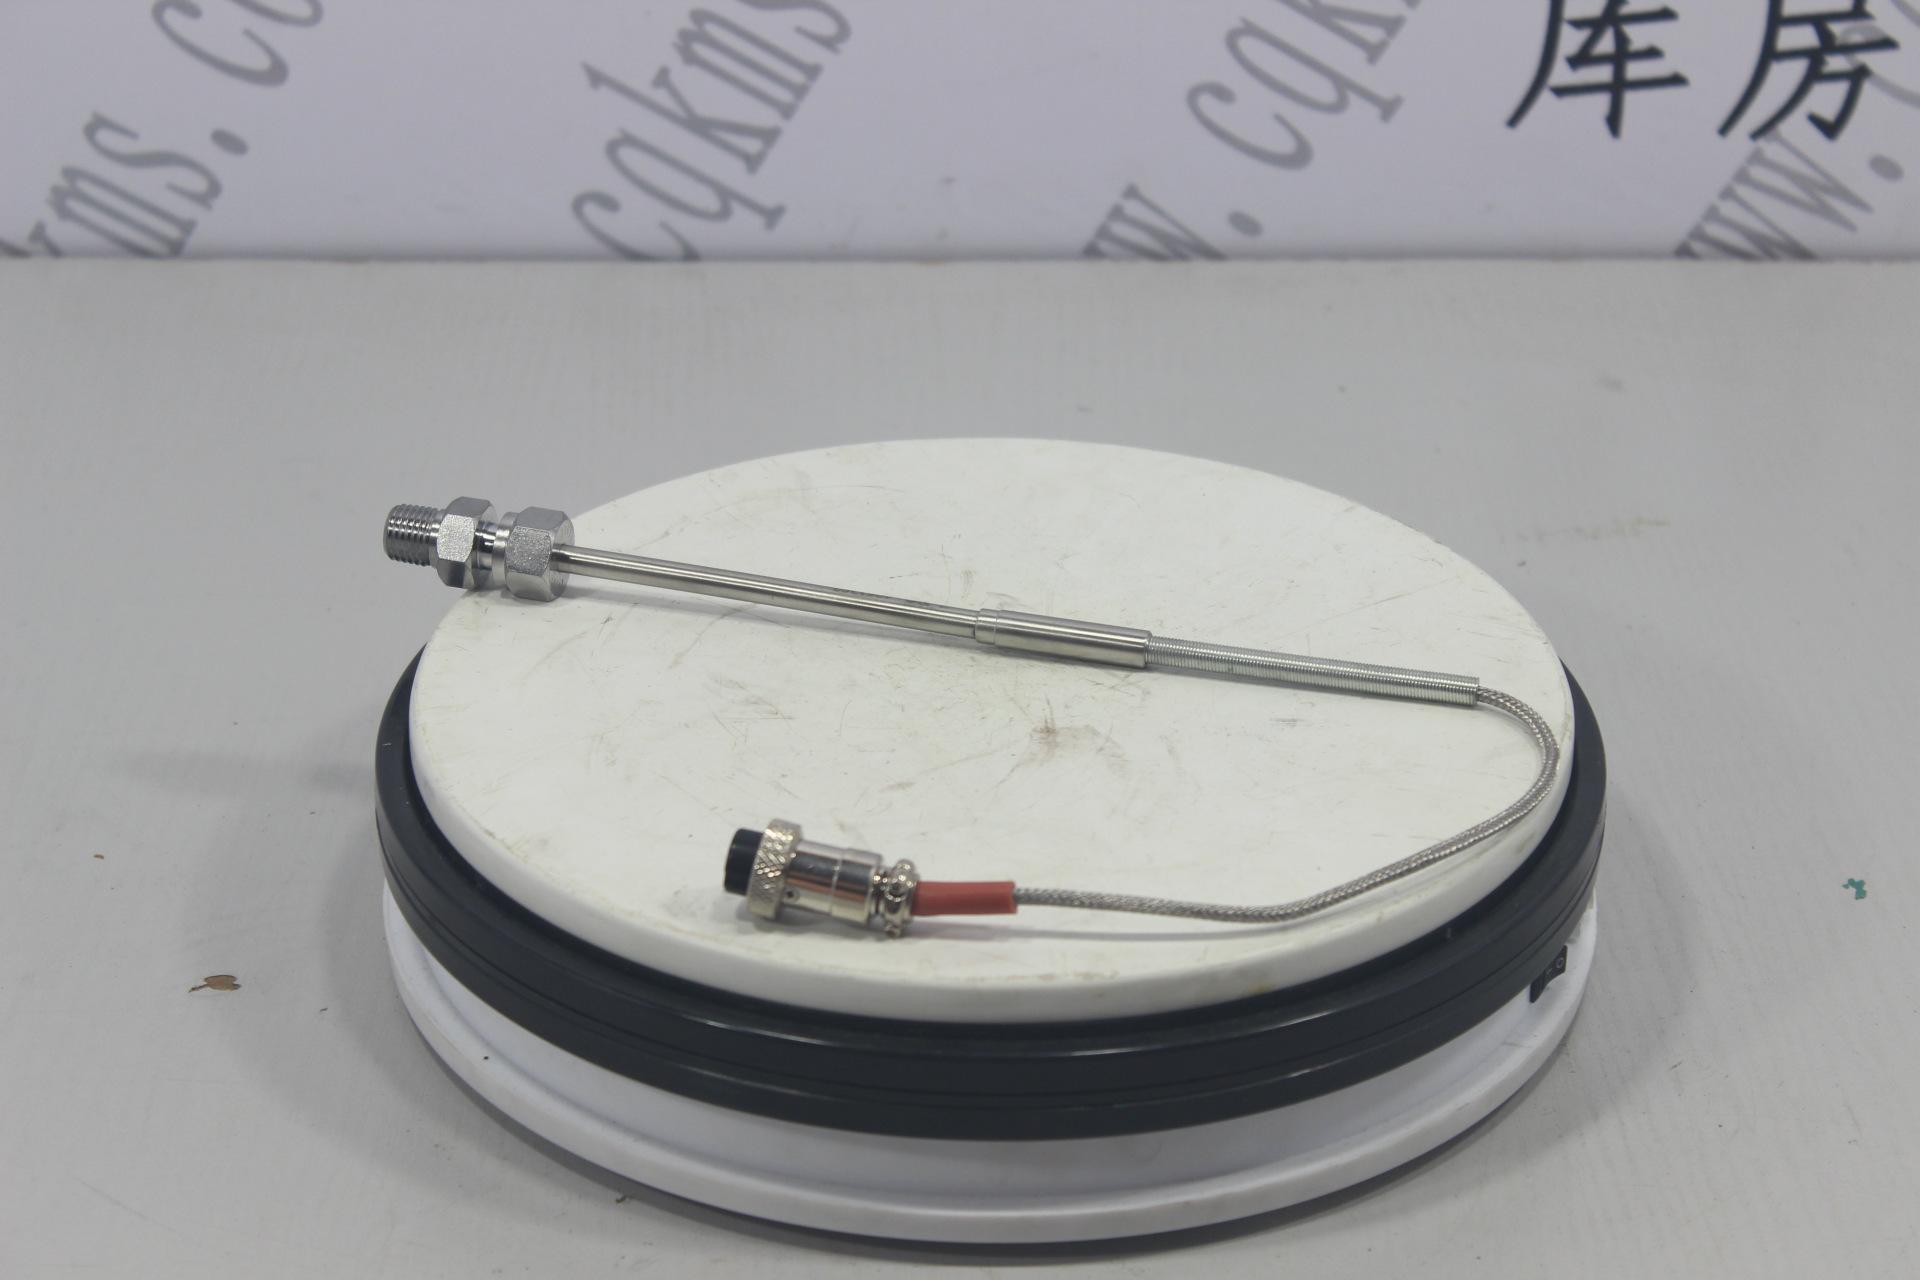 kms02144-4061392-热电偶---参考规格总长47cm,配套接头长4.3cm,内径0.6cm-参考重量0.055Kg-0.055Kg图片4